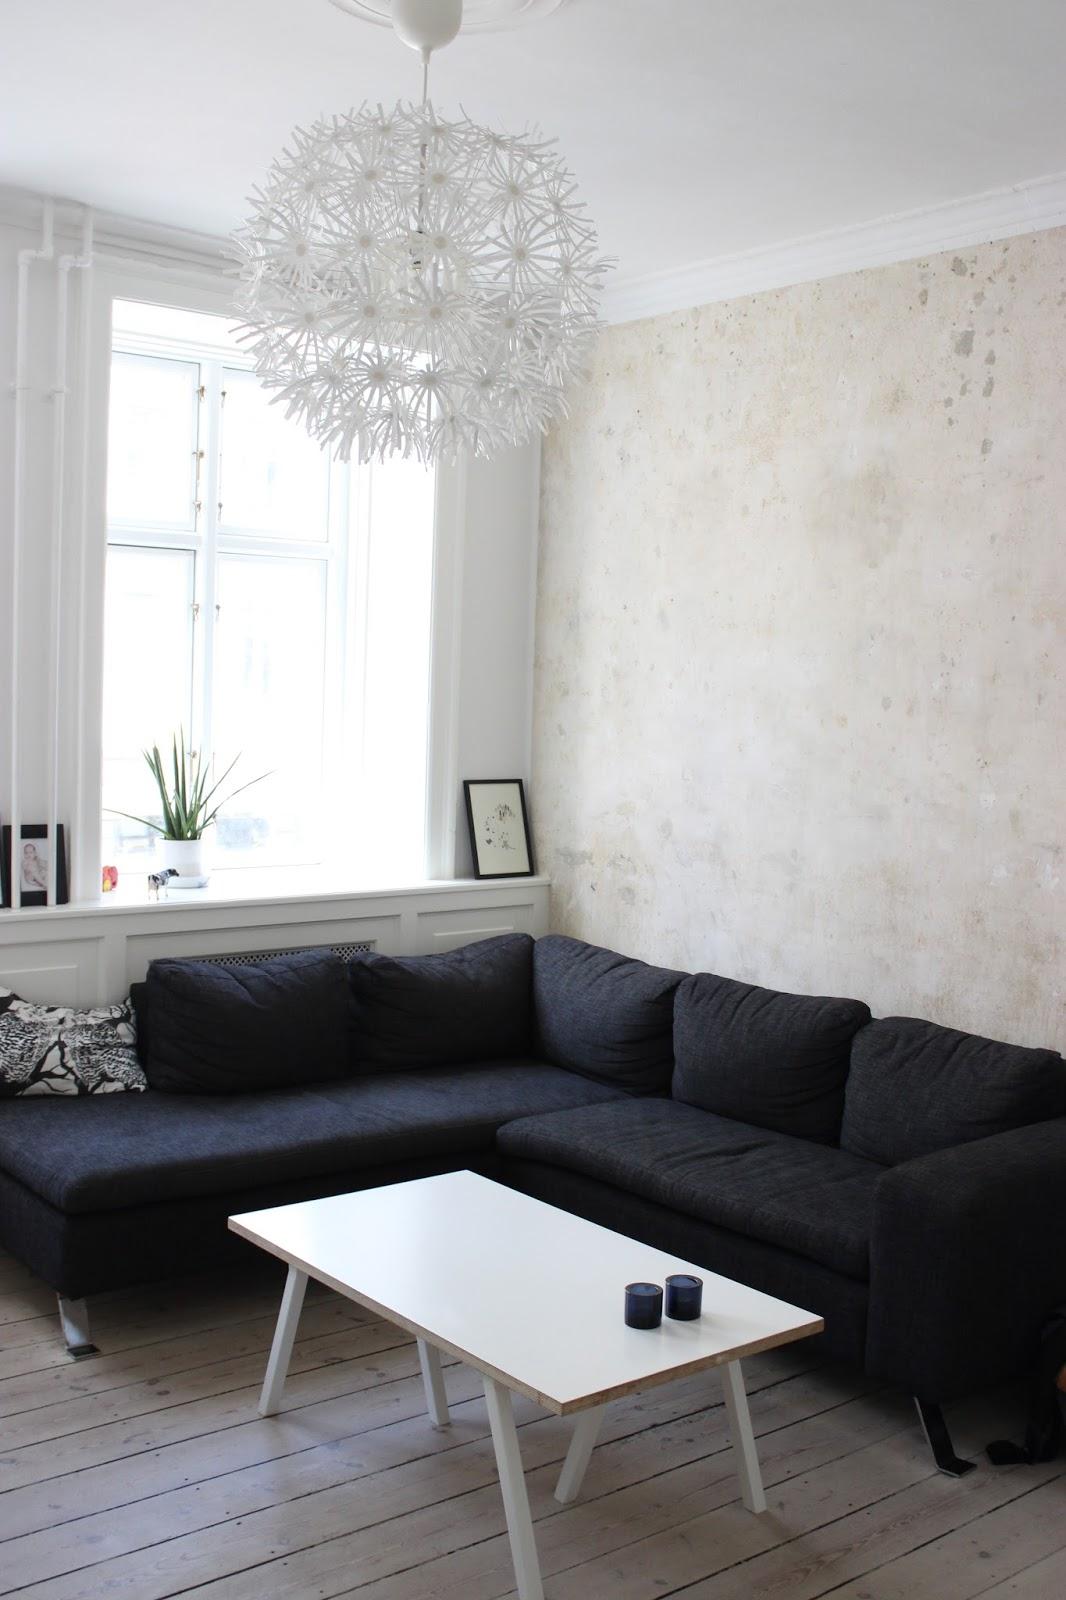 elbekind wohnen in kopenhagen wie ein kopenhagener. Black Bedroom Furniture Sets. Home Design Ideas